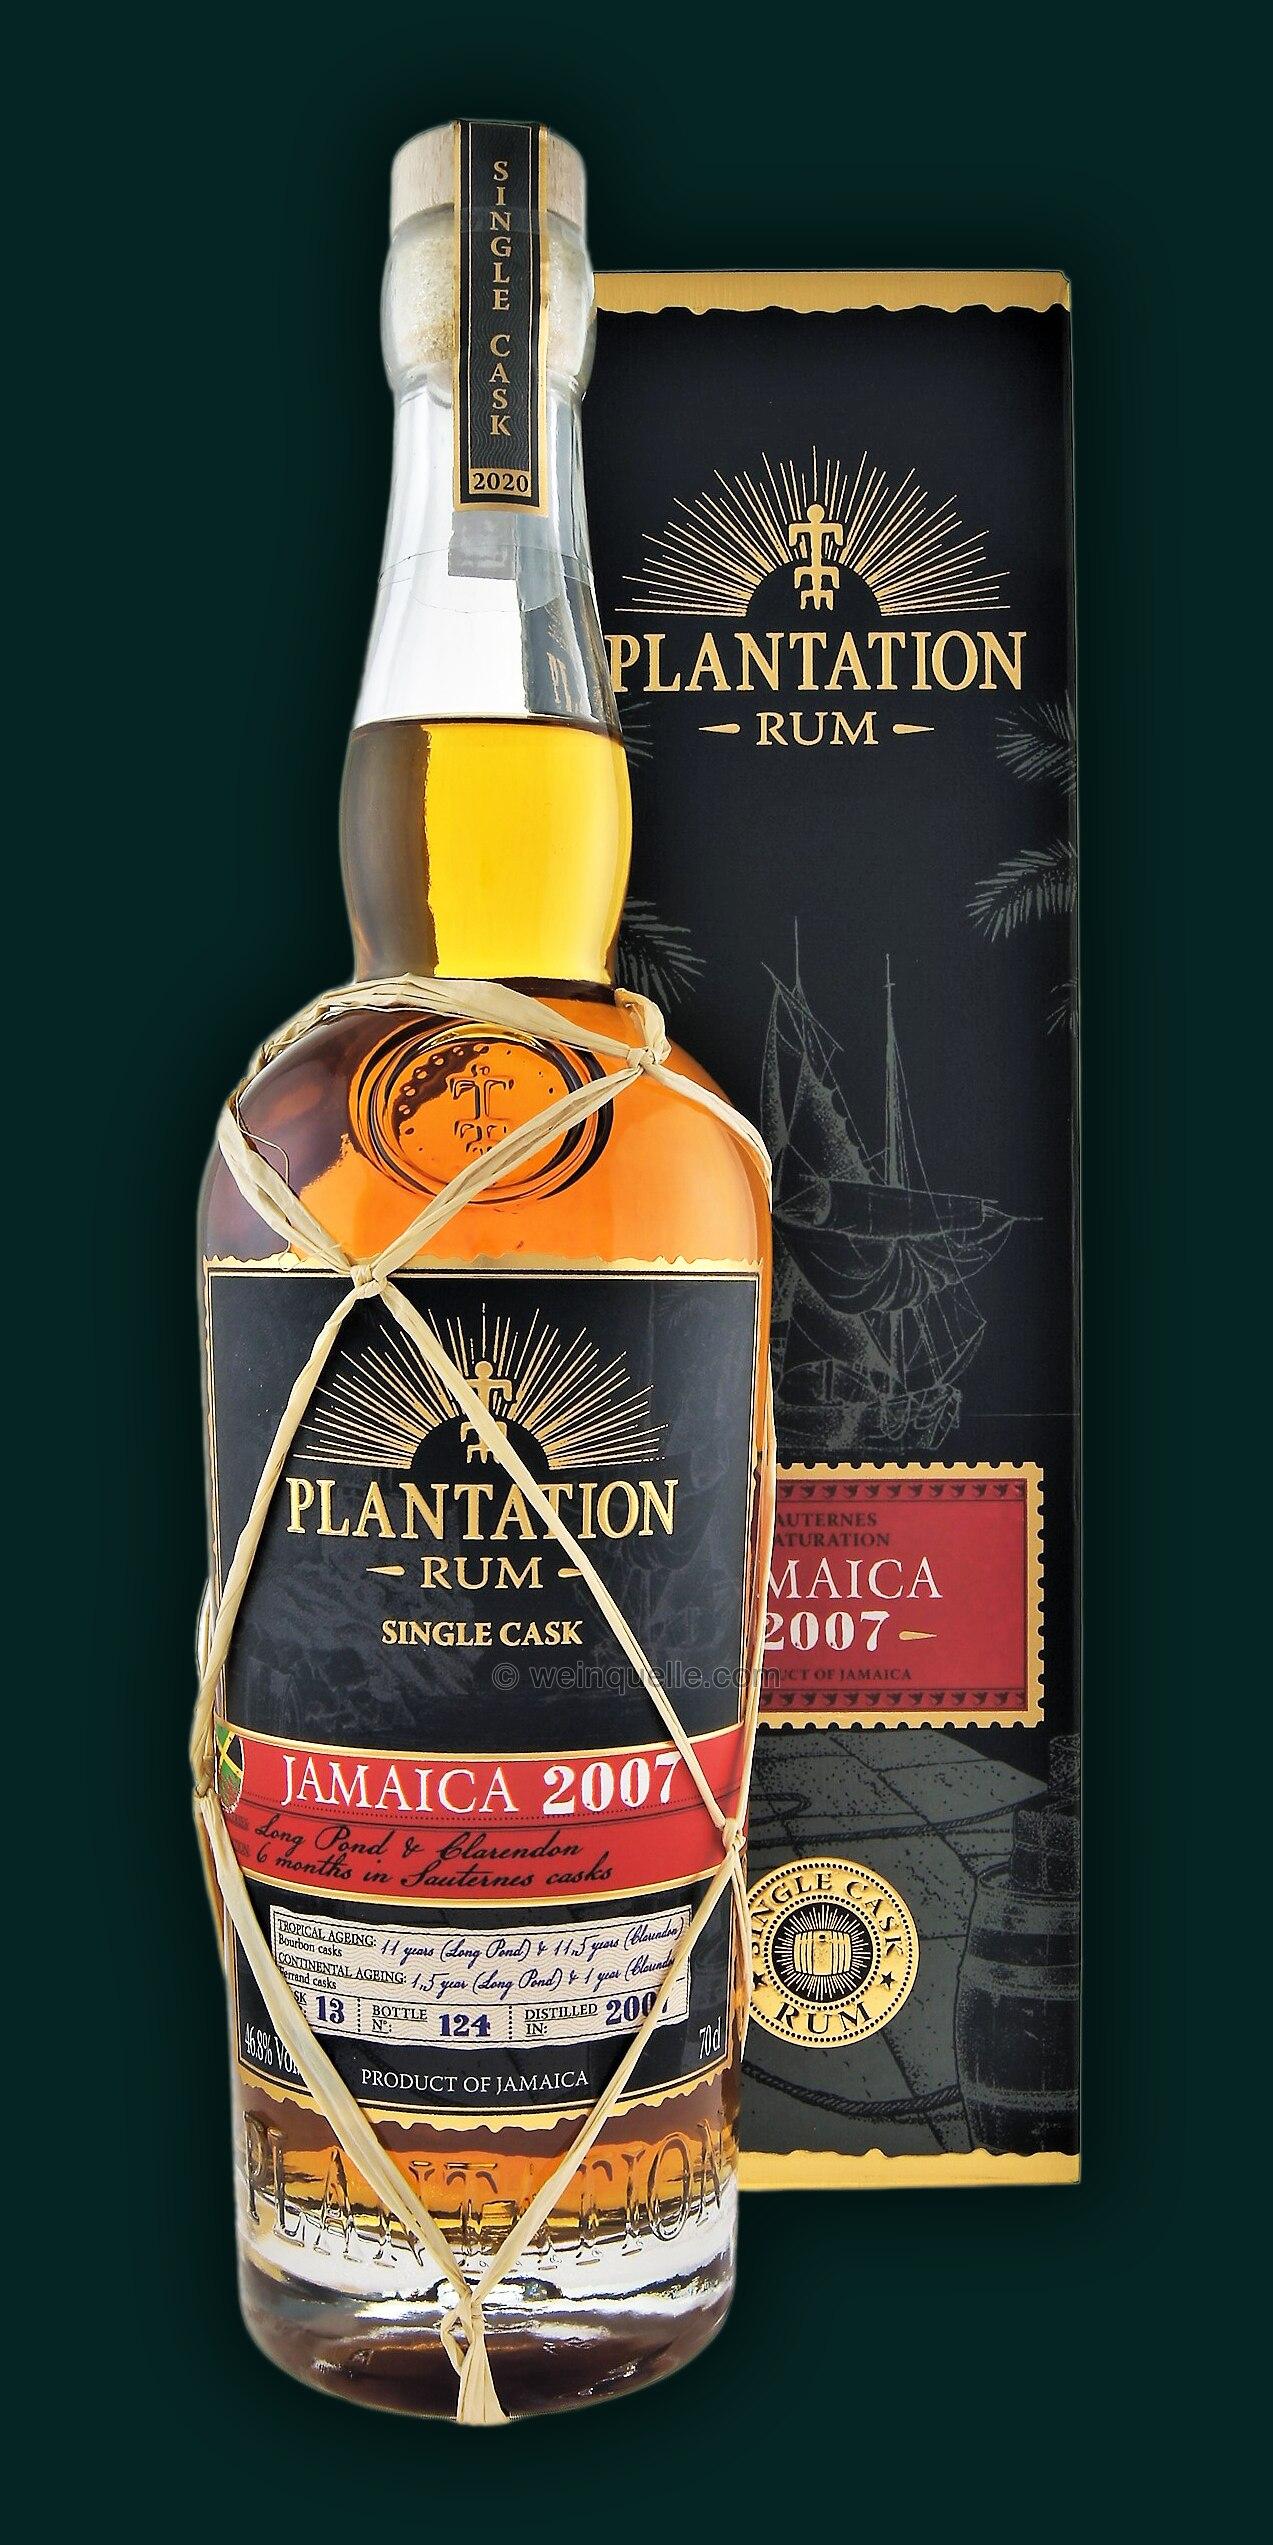 Plantation Jamaica Rum 2007/2020 Long Pond - Clarendon 46 ...